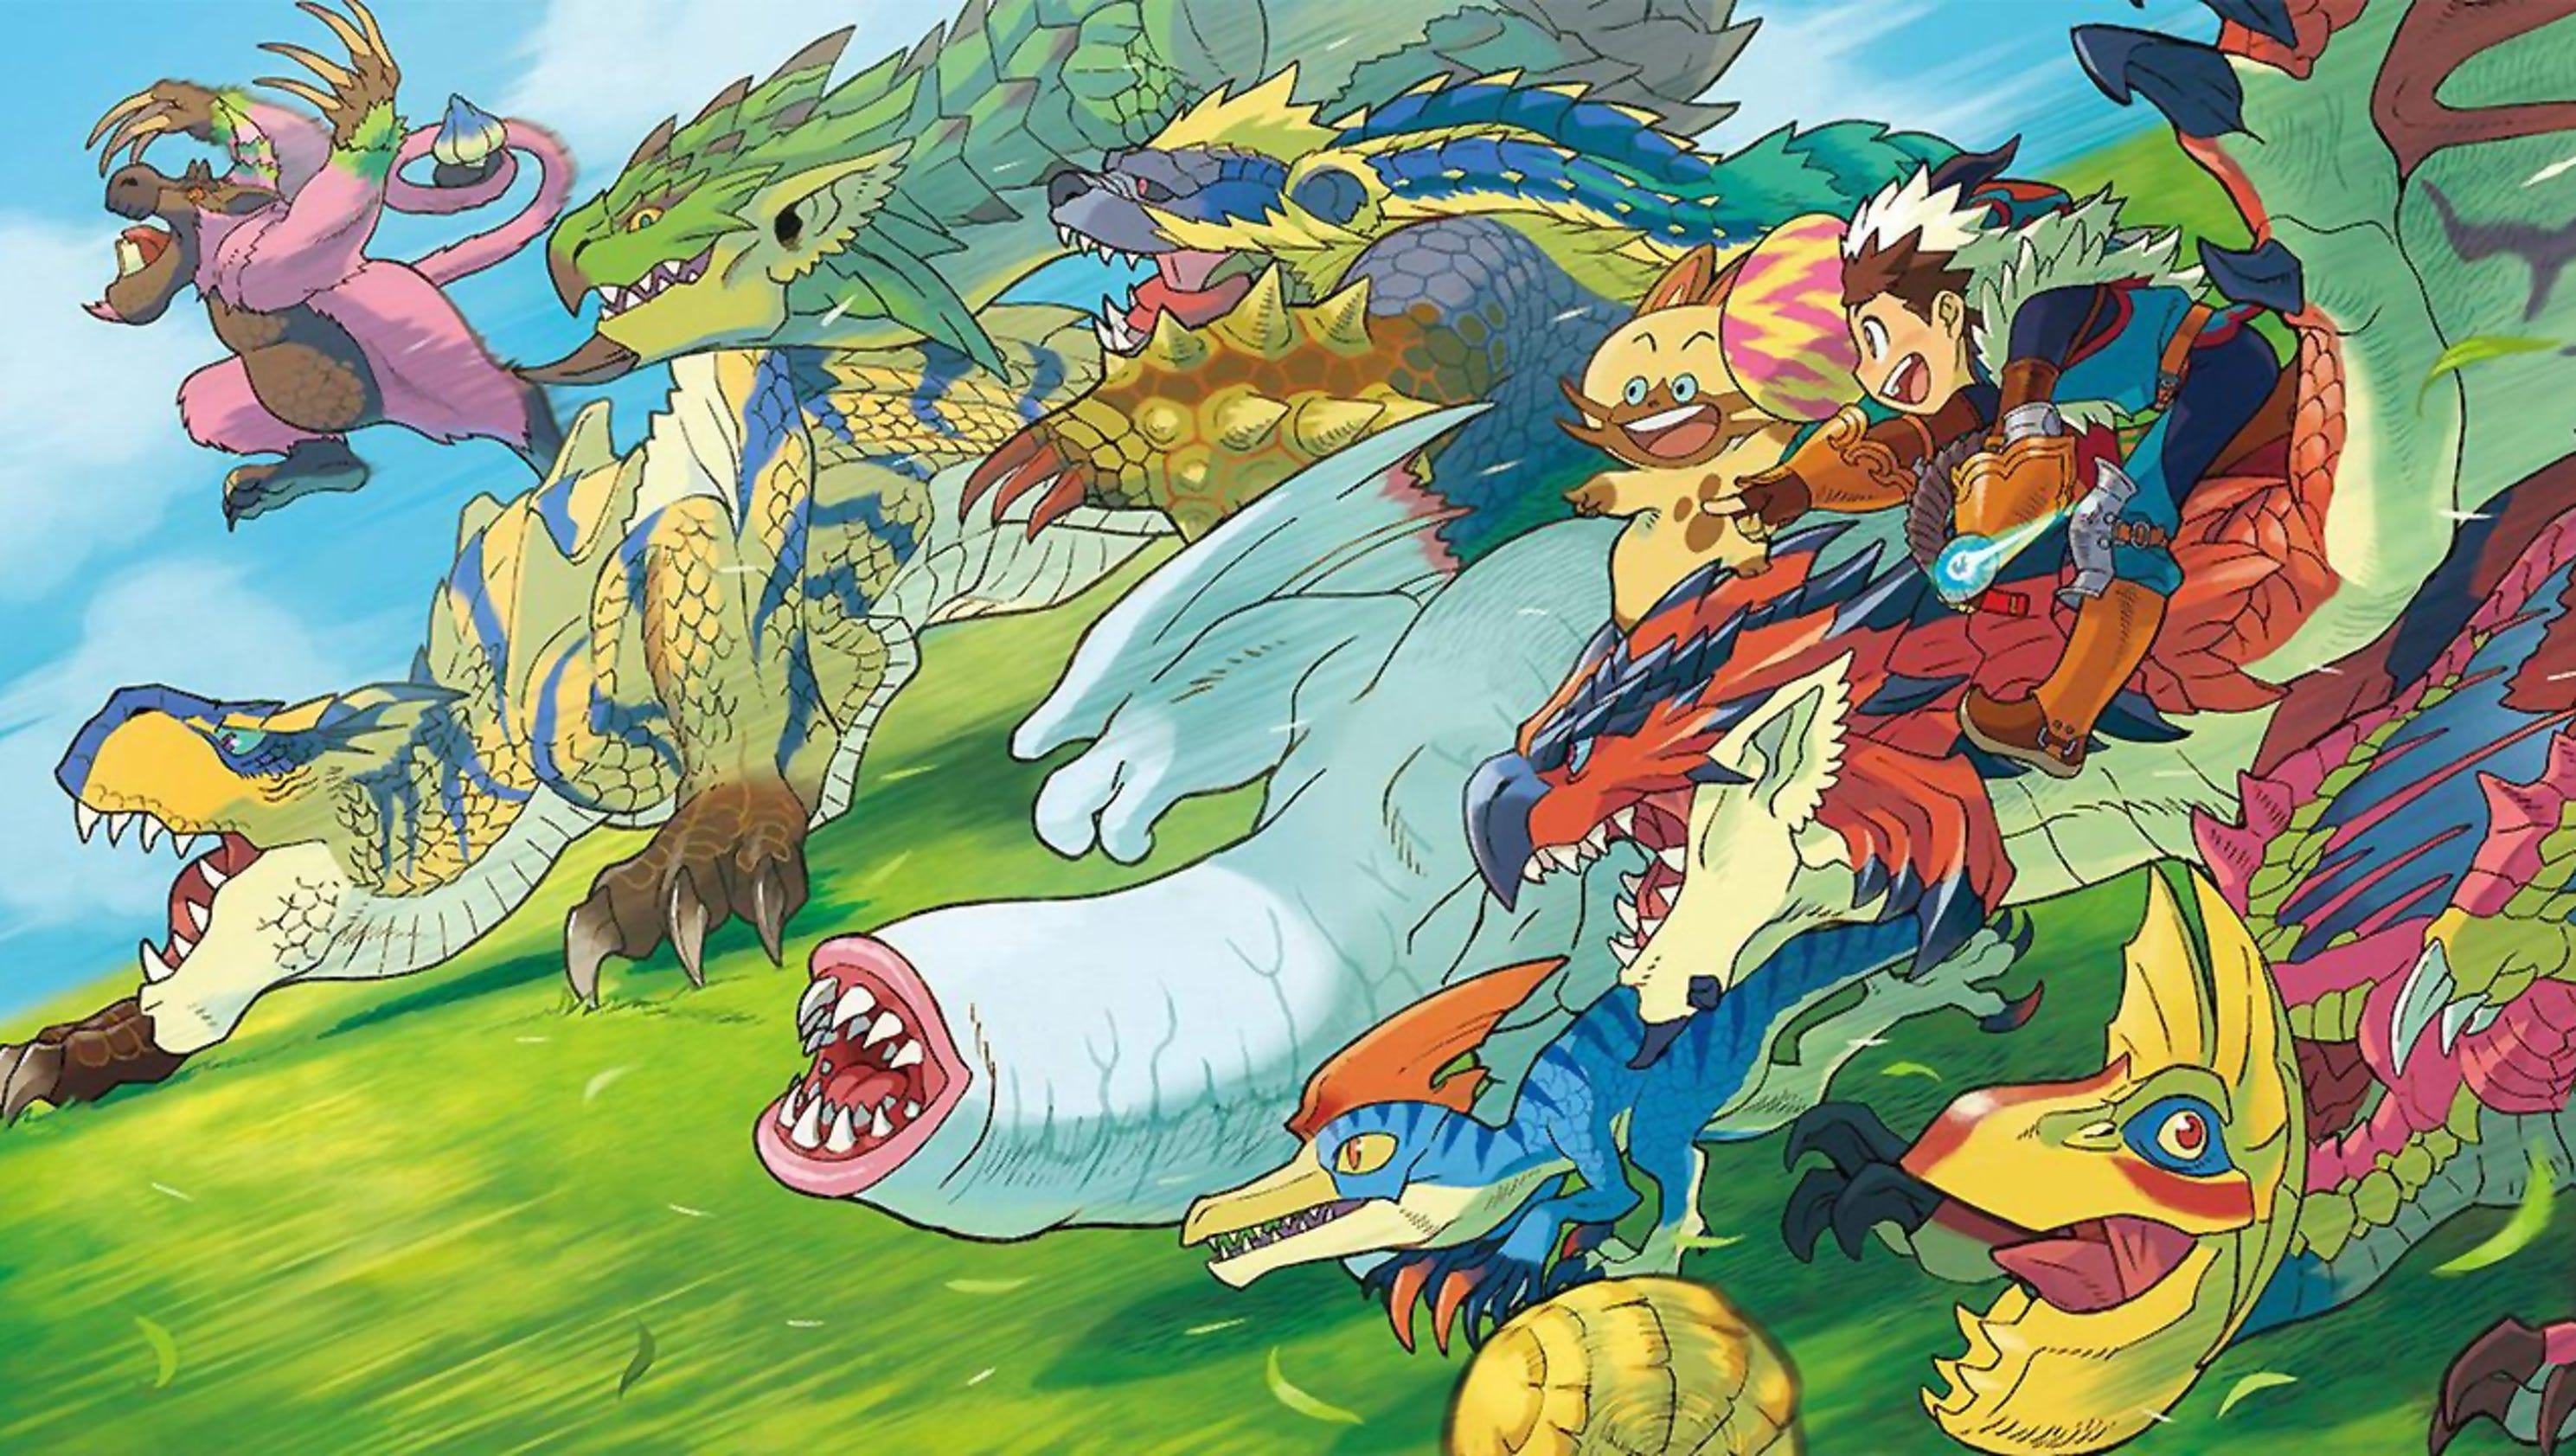 El Dorado Blue Card >> Monster Hunter Stories Guide: Basics, Monster & Egg Locations, Combat Tips | Technobubble